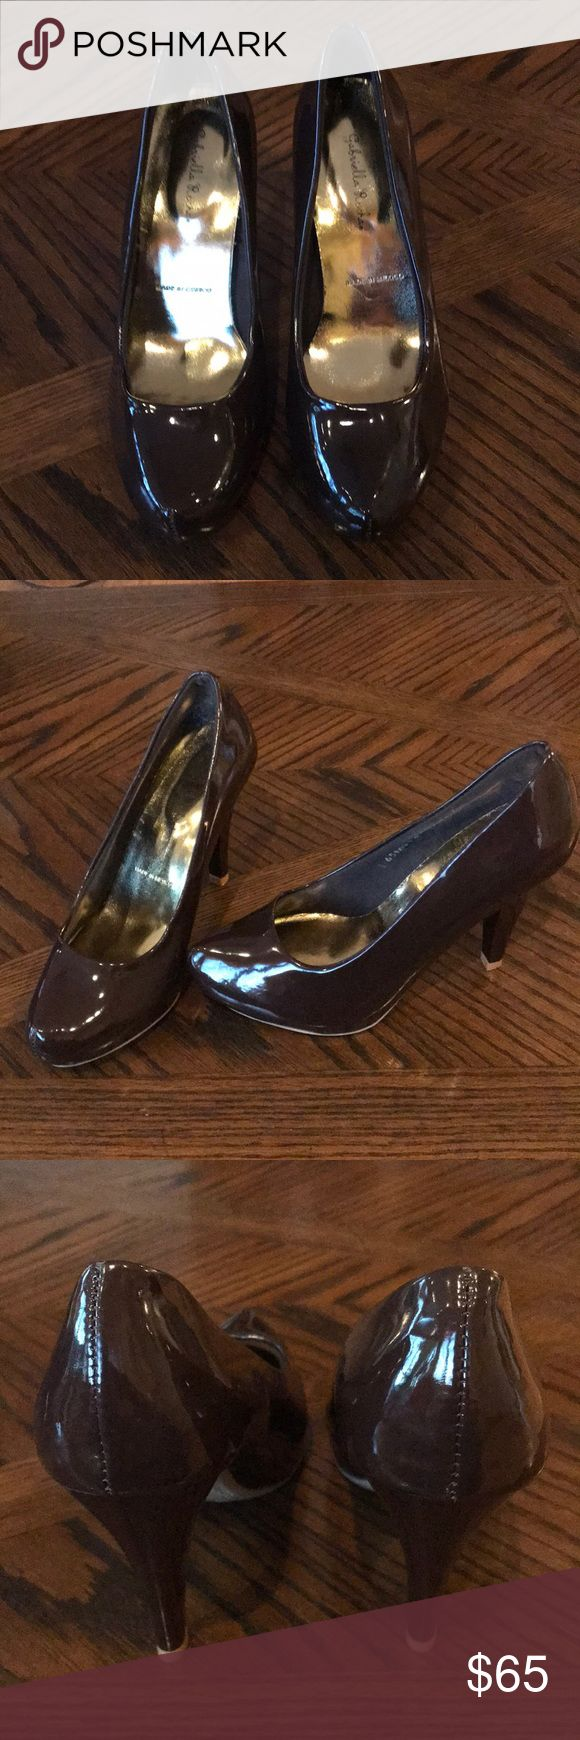 "Chocolate Brown Patent Leather Almond Toe Pumps Gabriella Rocha brand new 4"" heels with 1/2"" Hidden platform. Really pretty. Classic design. Gabriella Rocha Shoes Heels"